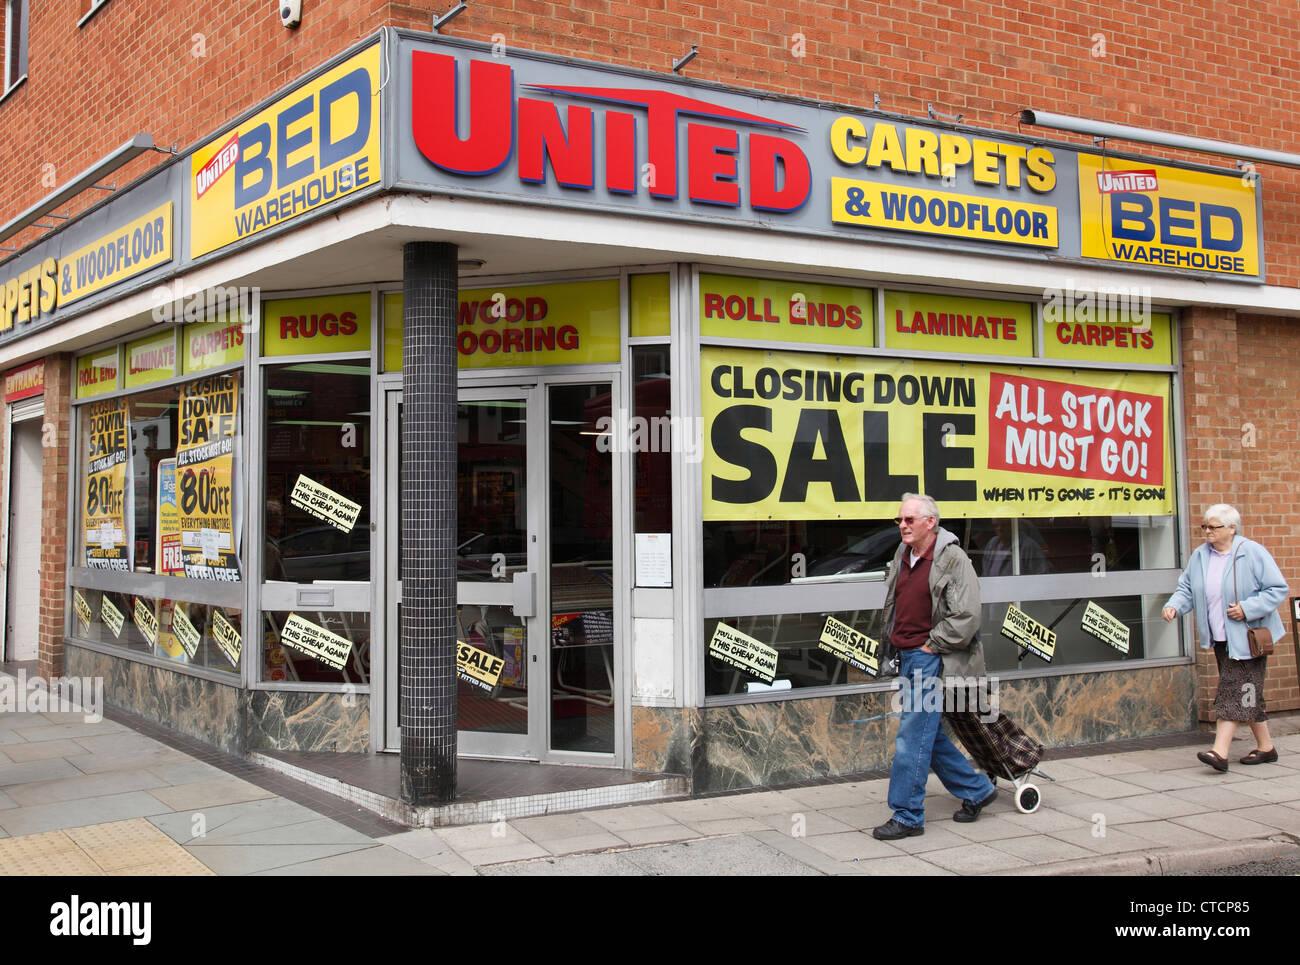 A United Carpets store in Melton Mowbray, England, U.K. - Stock Image